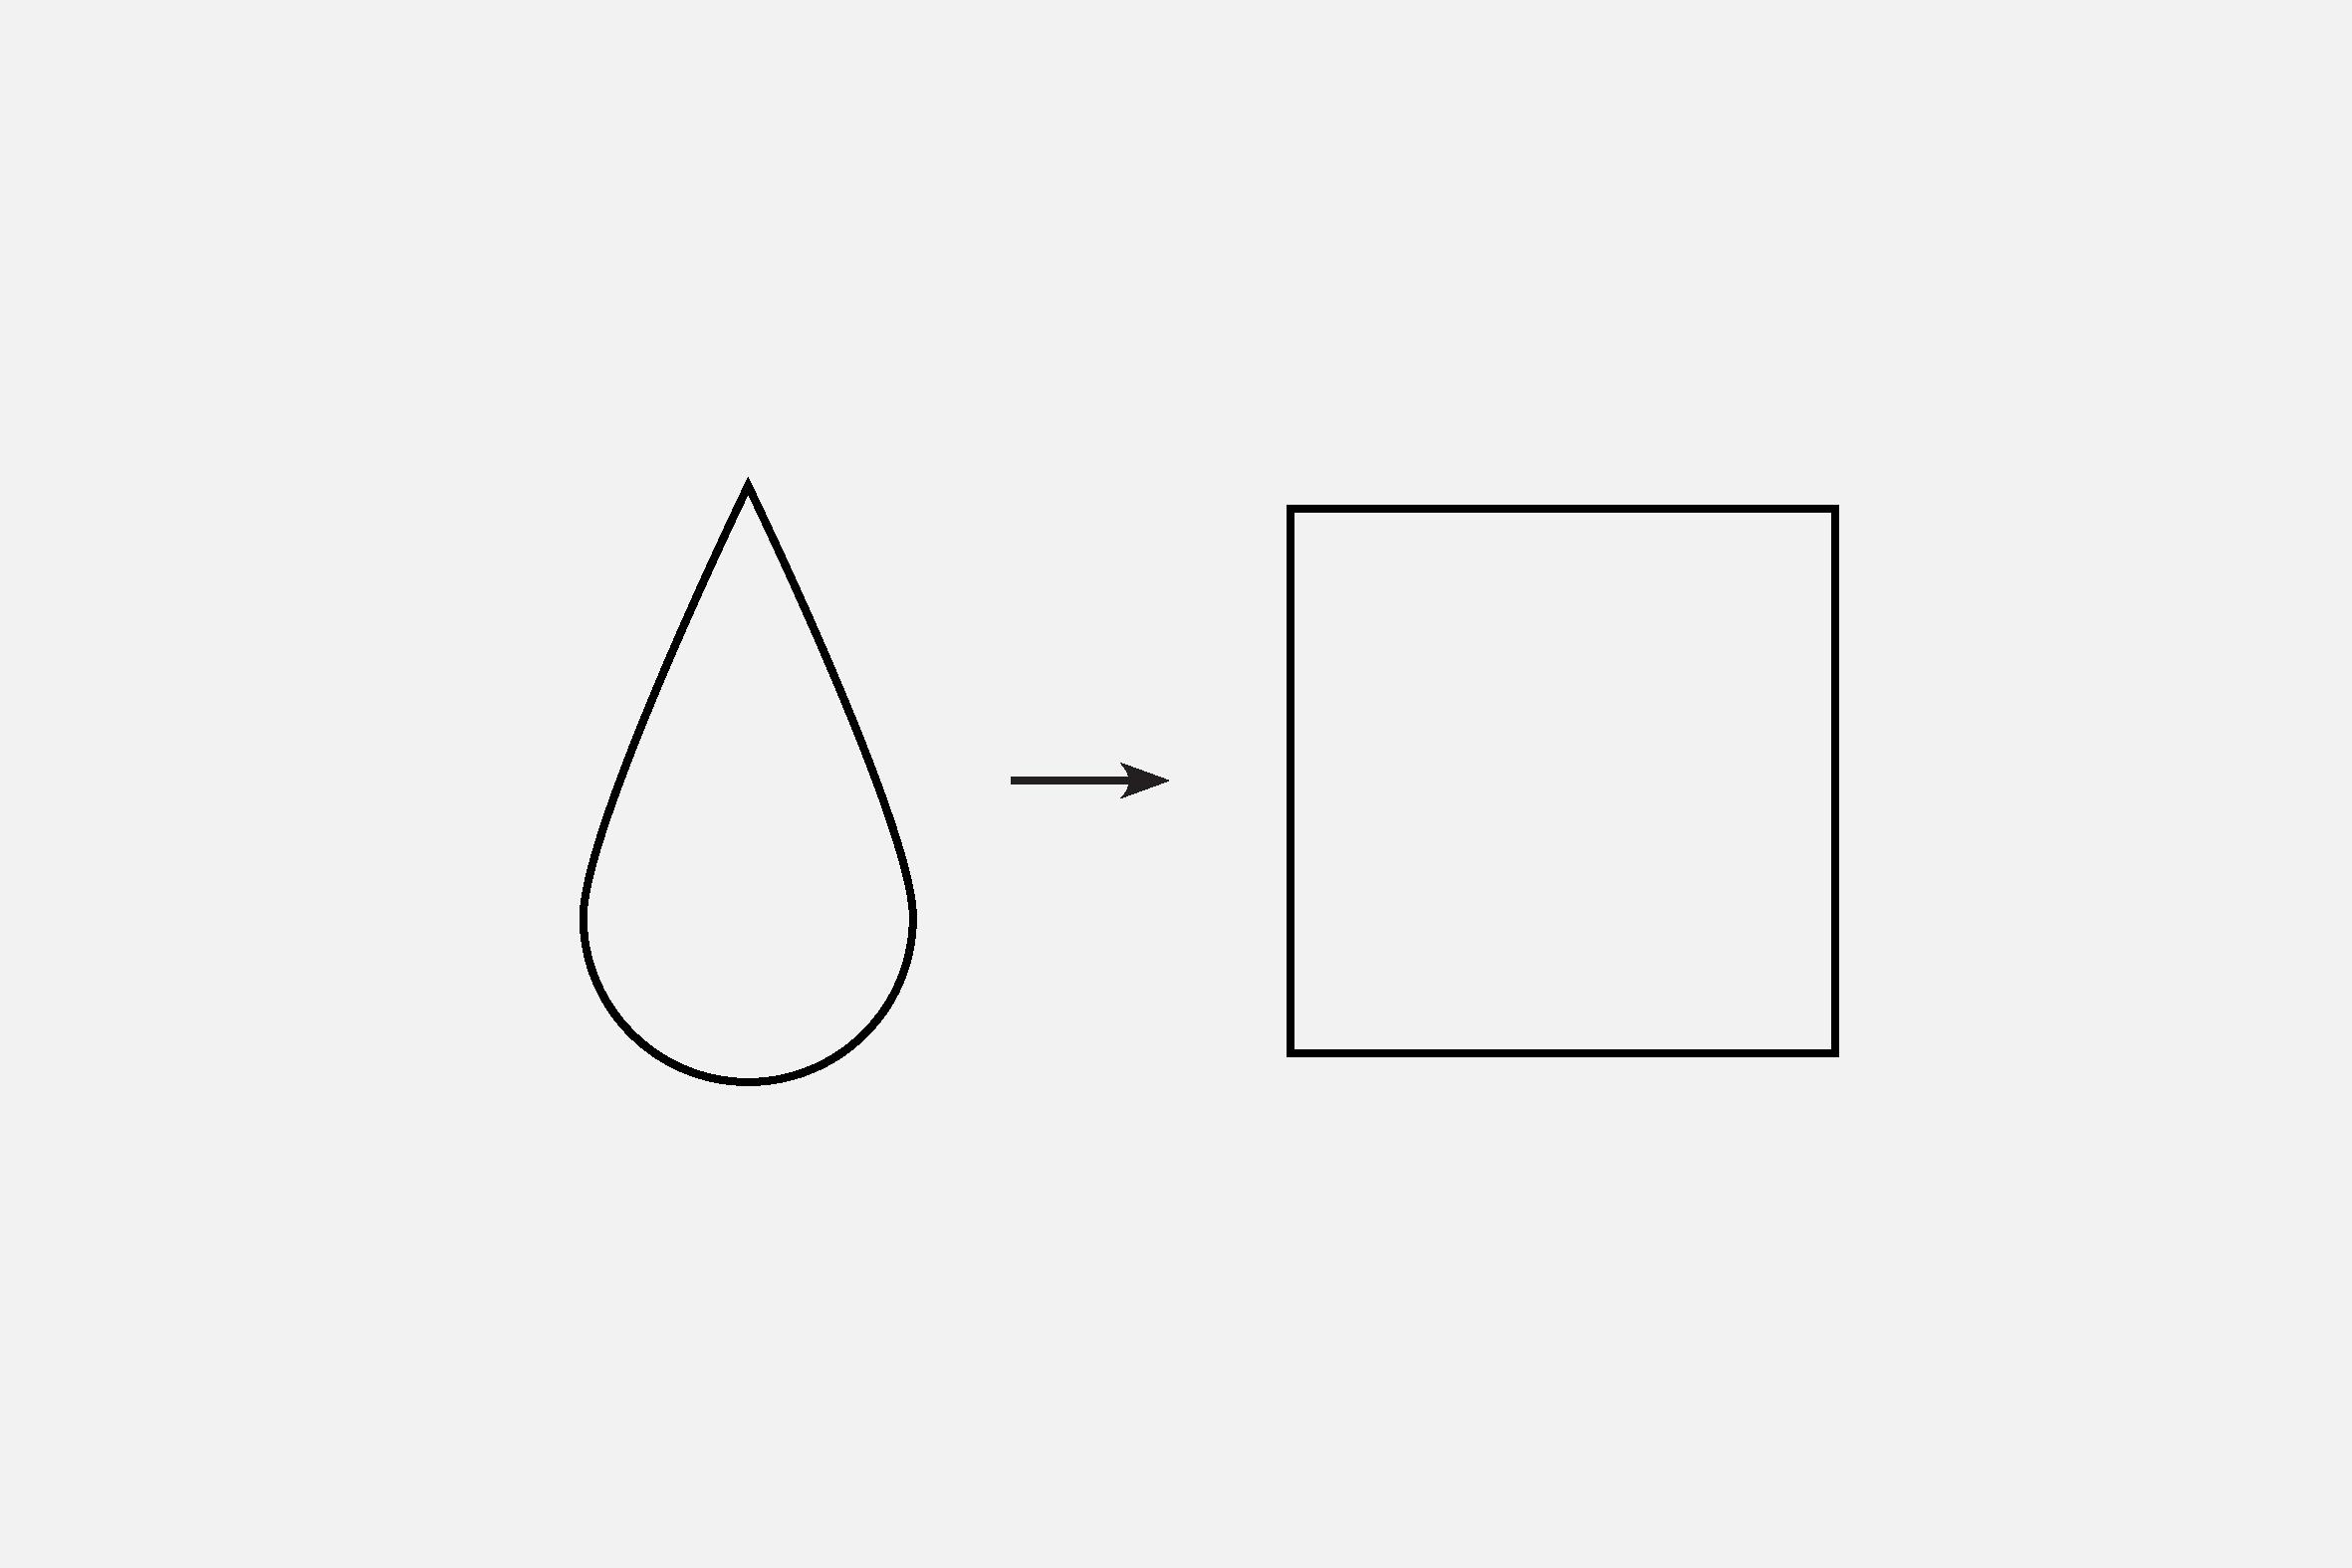 Droplite-logo-reasoning-Daniel-Cavalcanti